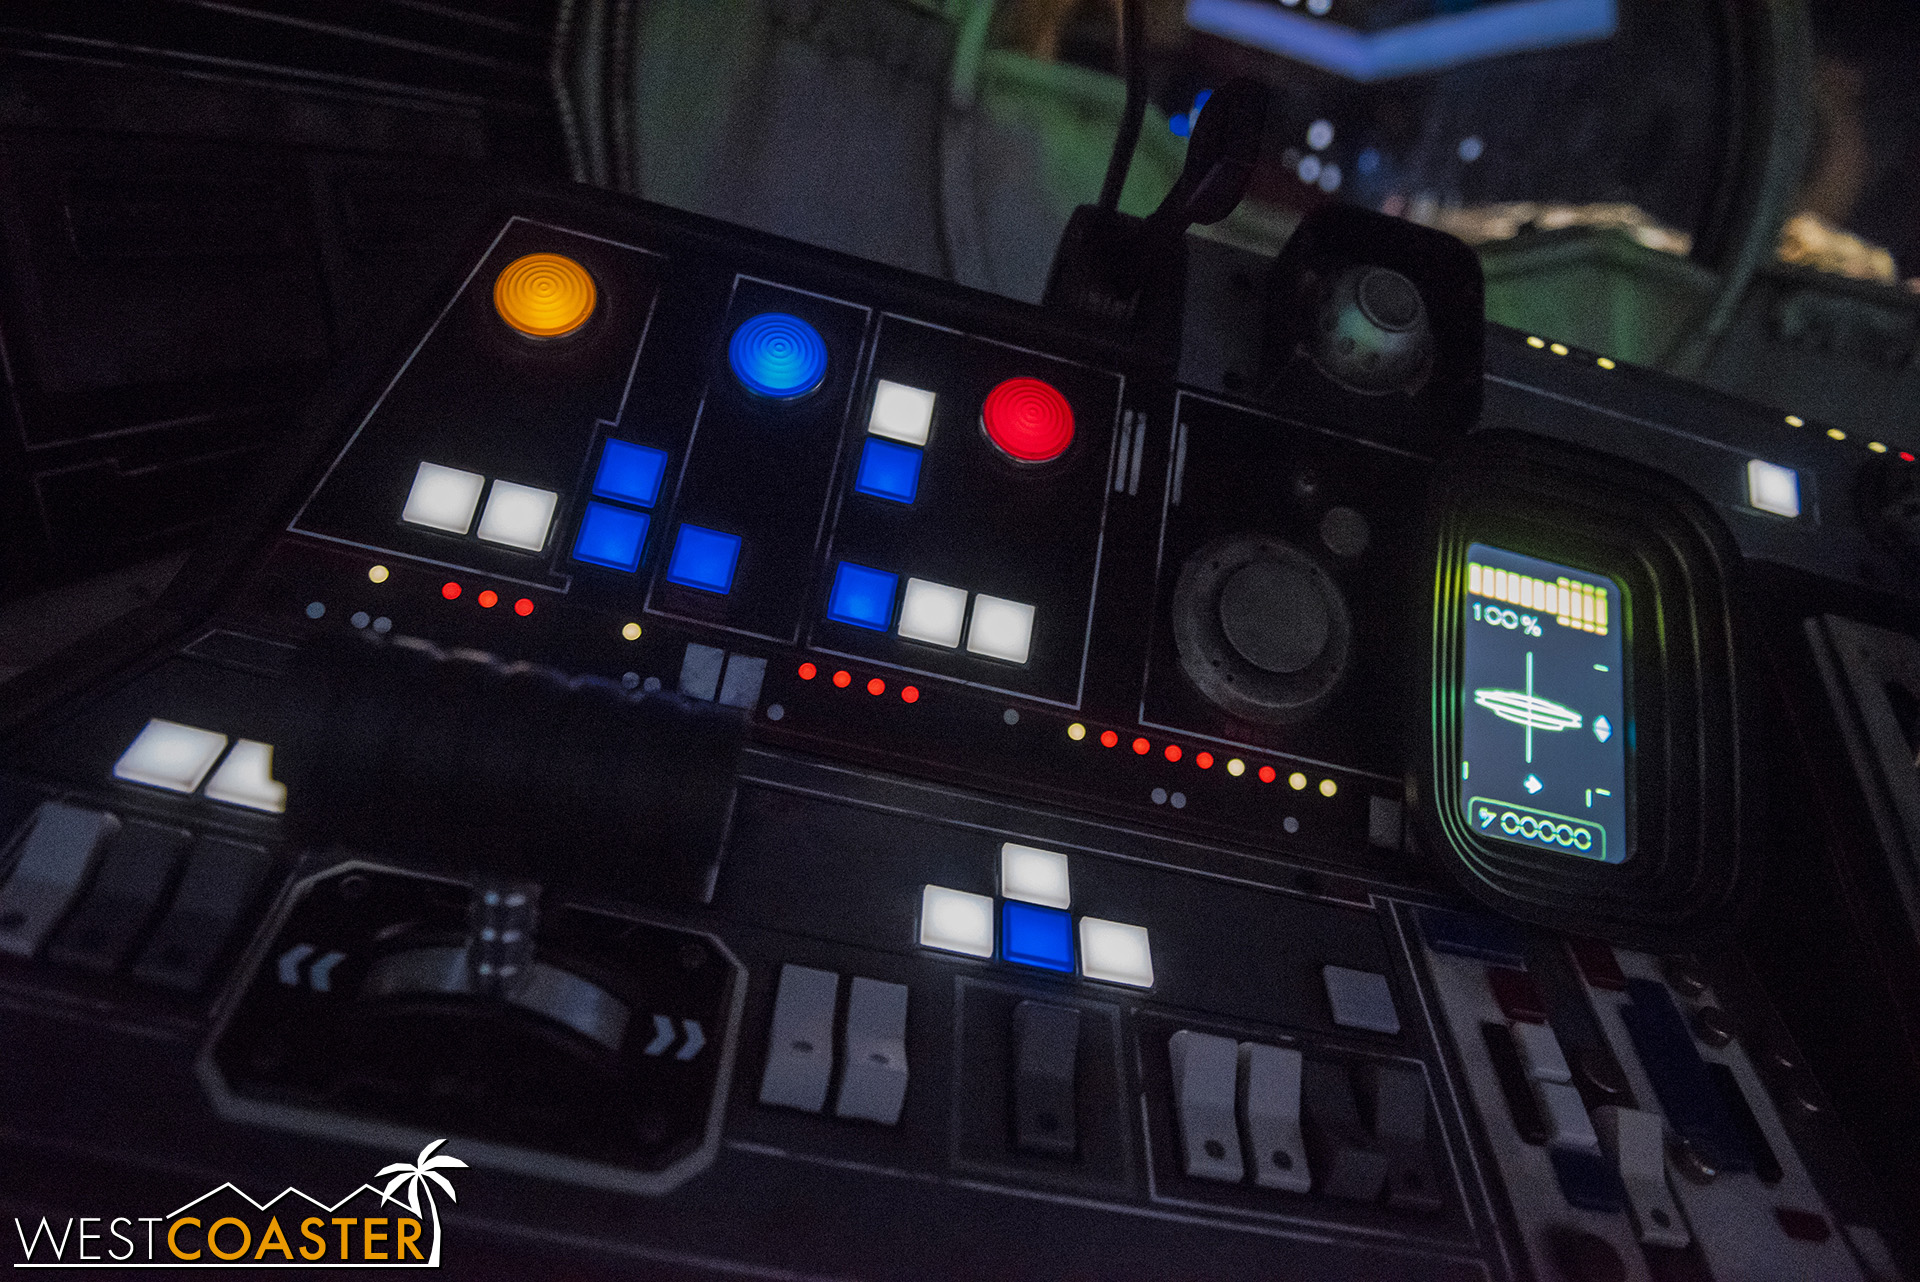 DLR-19_0606-D-Cockpit-0001.jpg